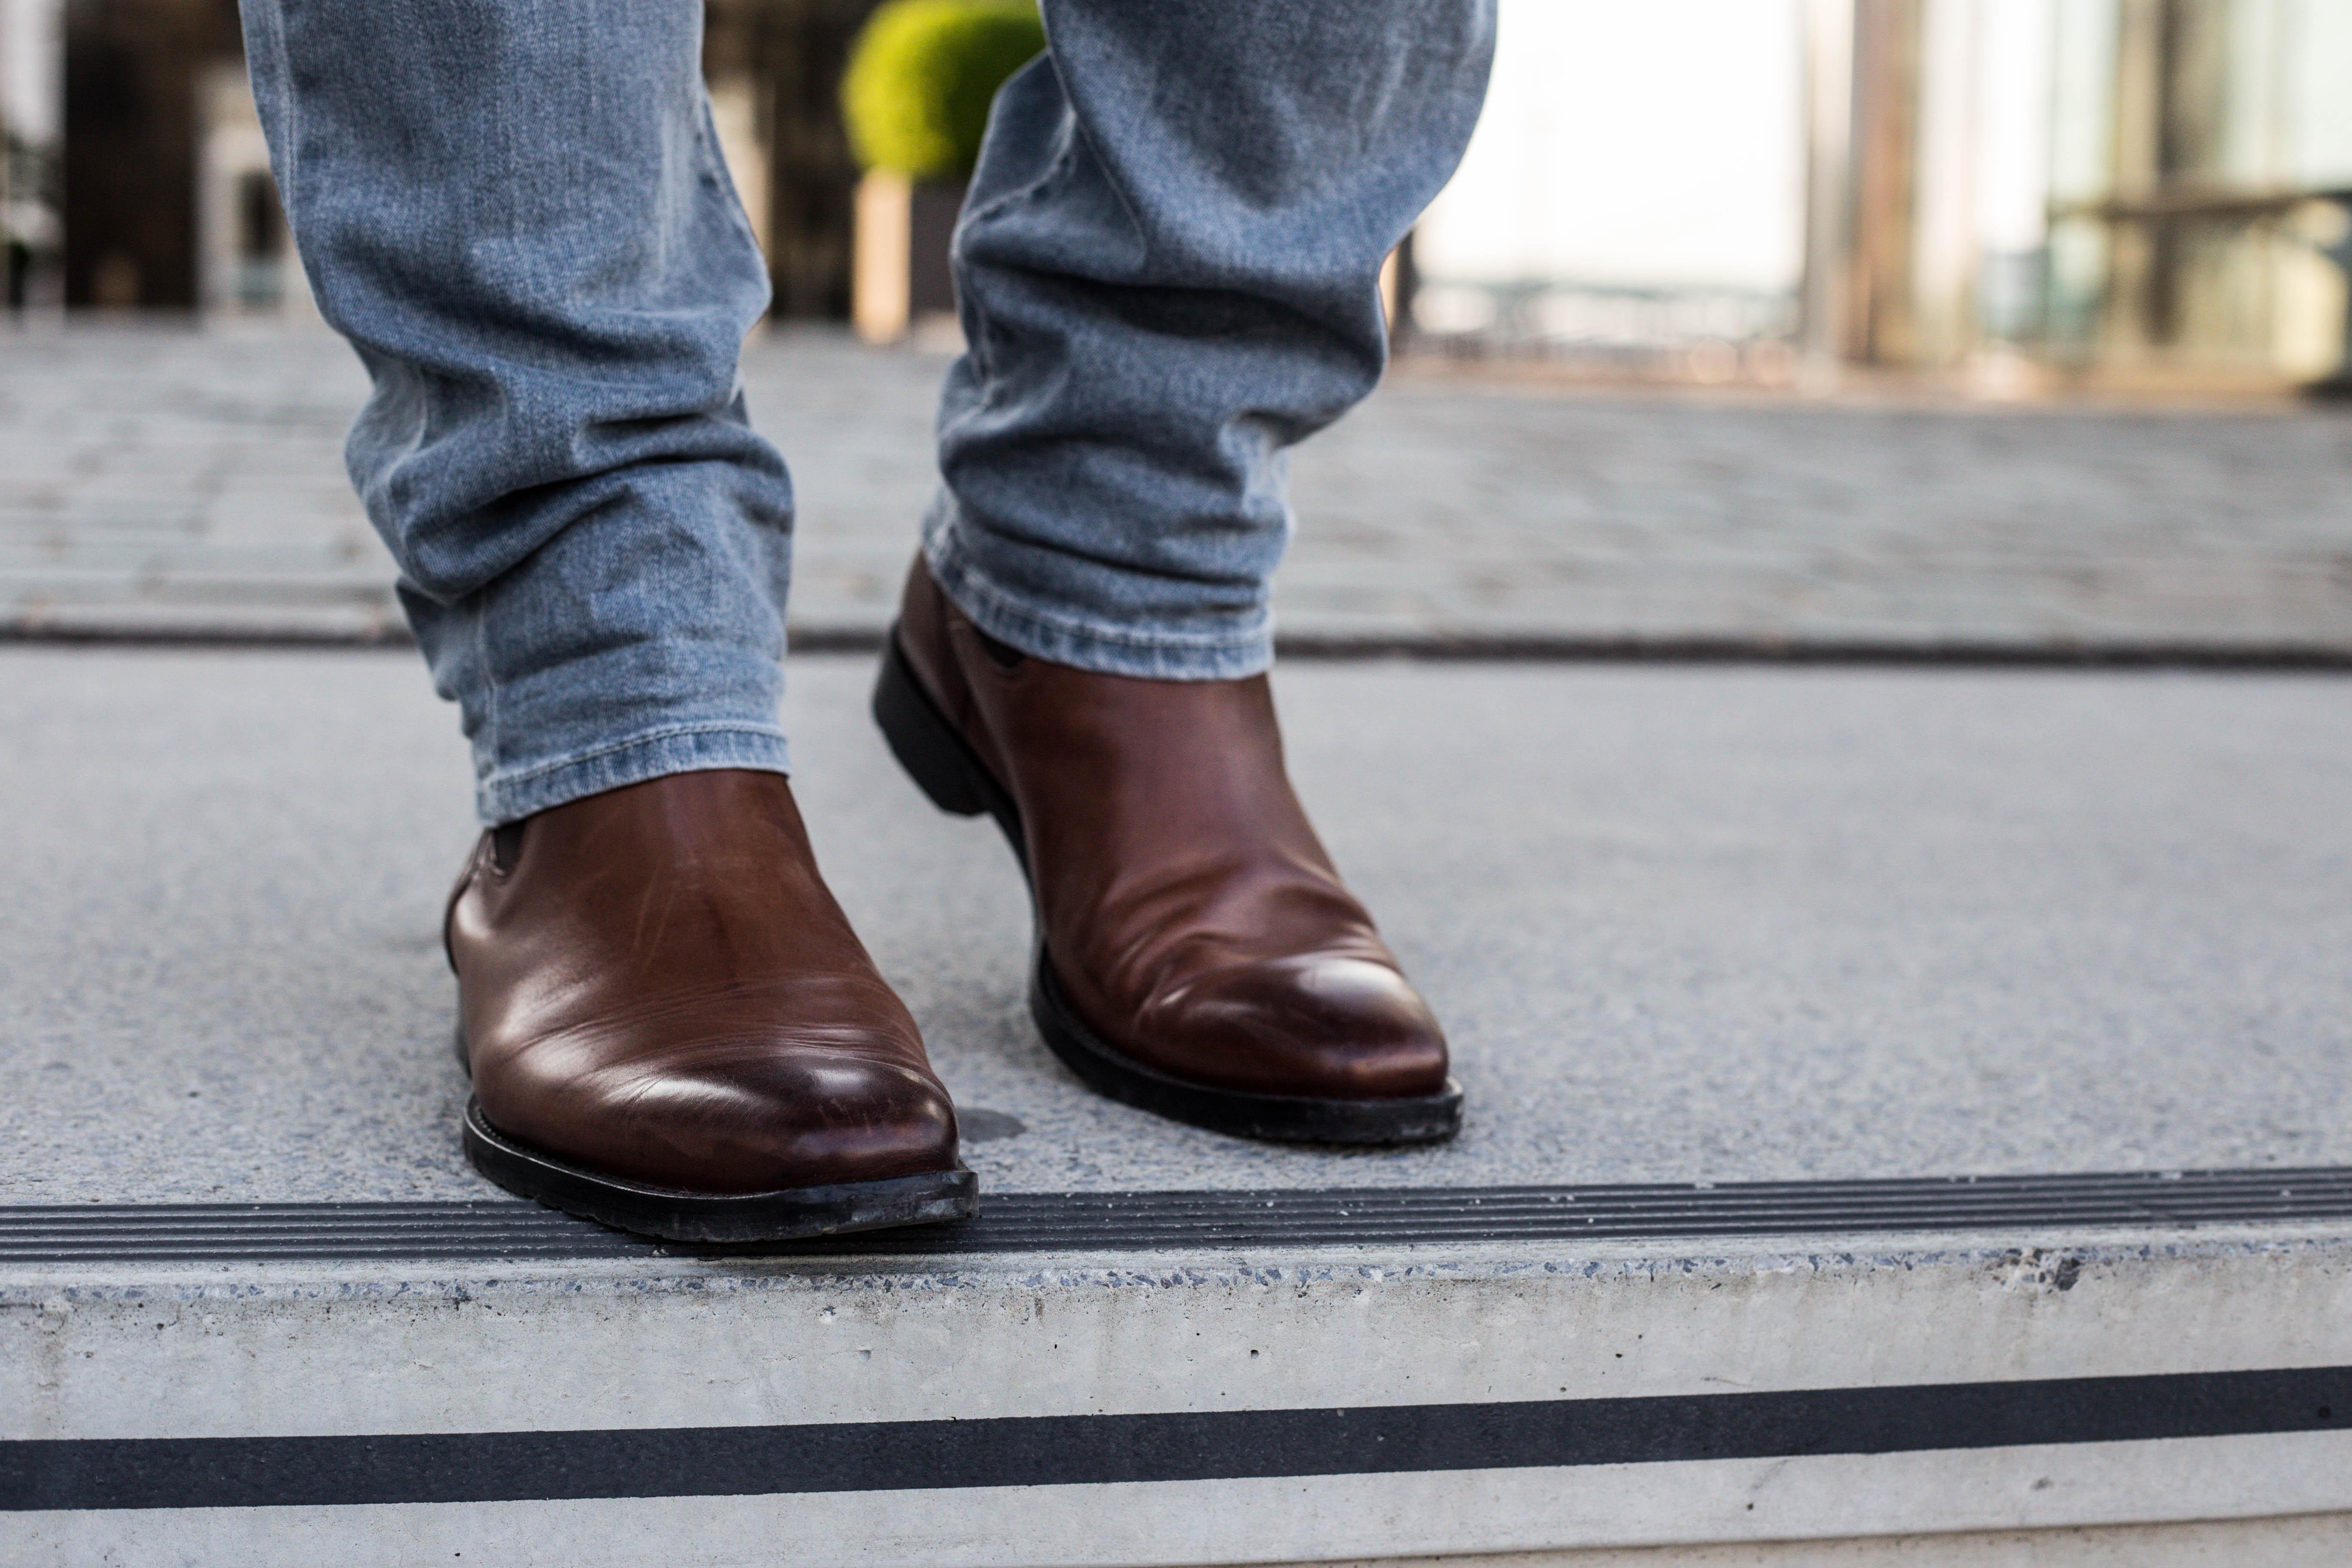 kariertes-hemd-skinny-jeans-fashionblog-menfashion-chelsea-boots-gruener-kurz-parka_7711